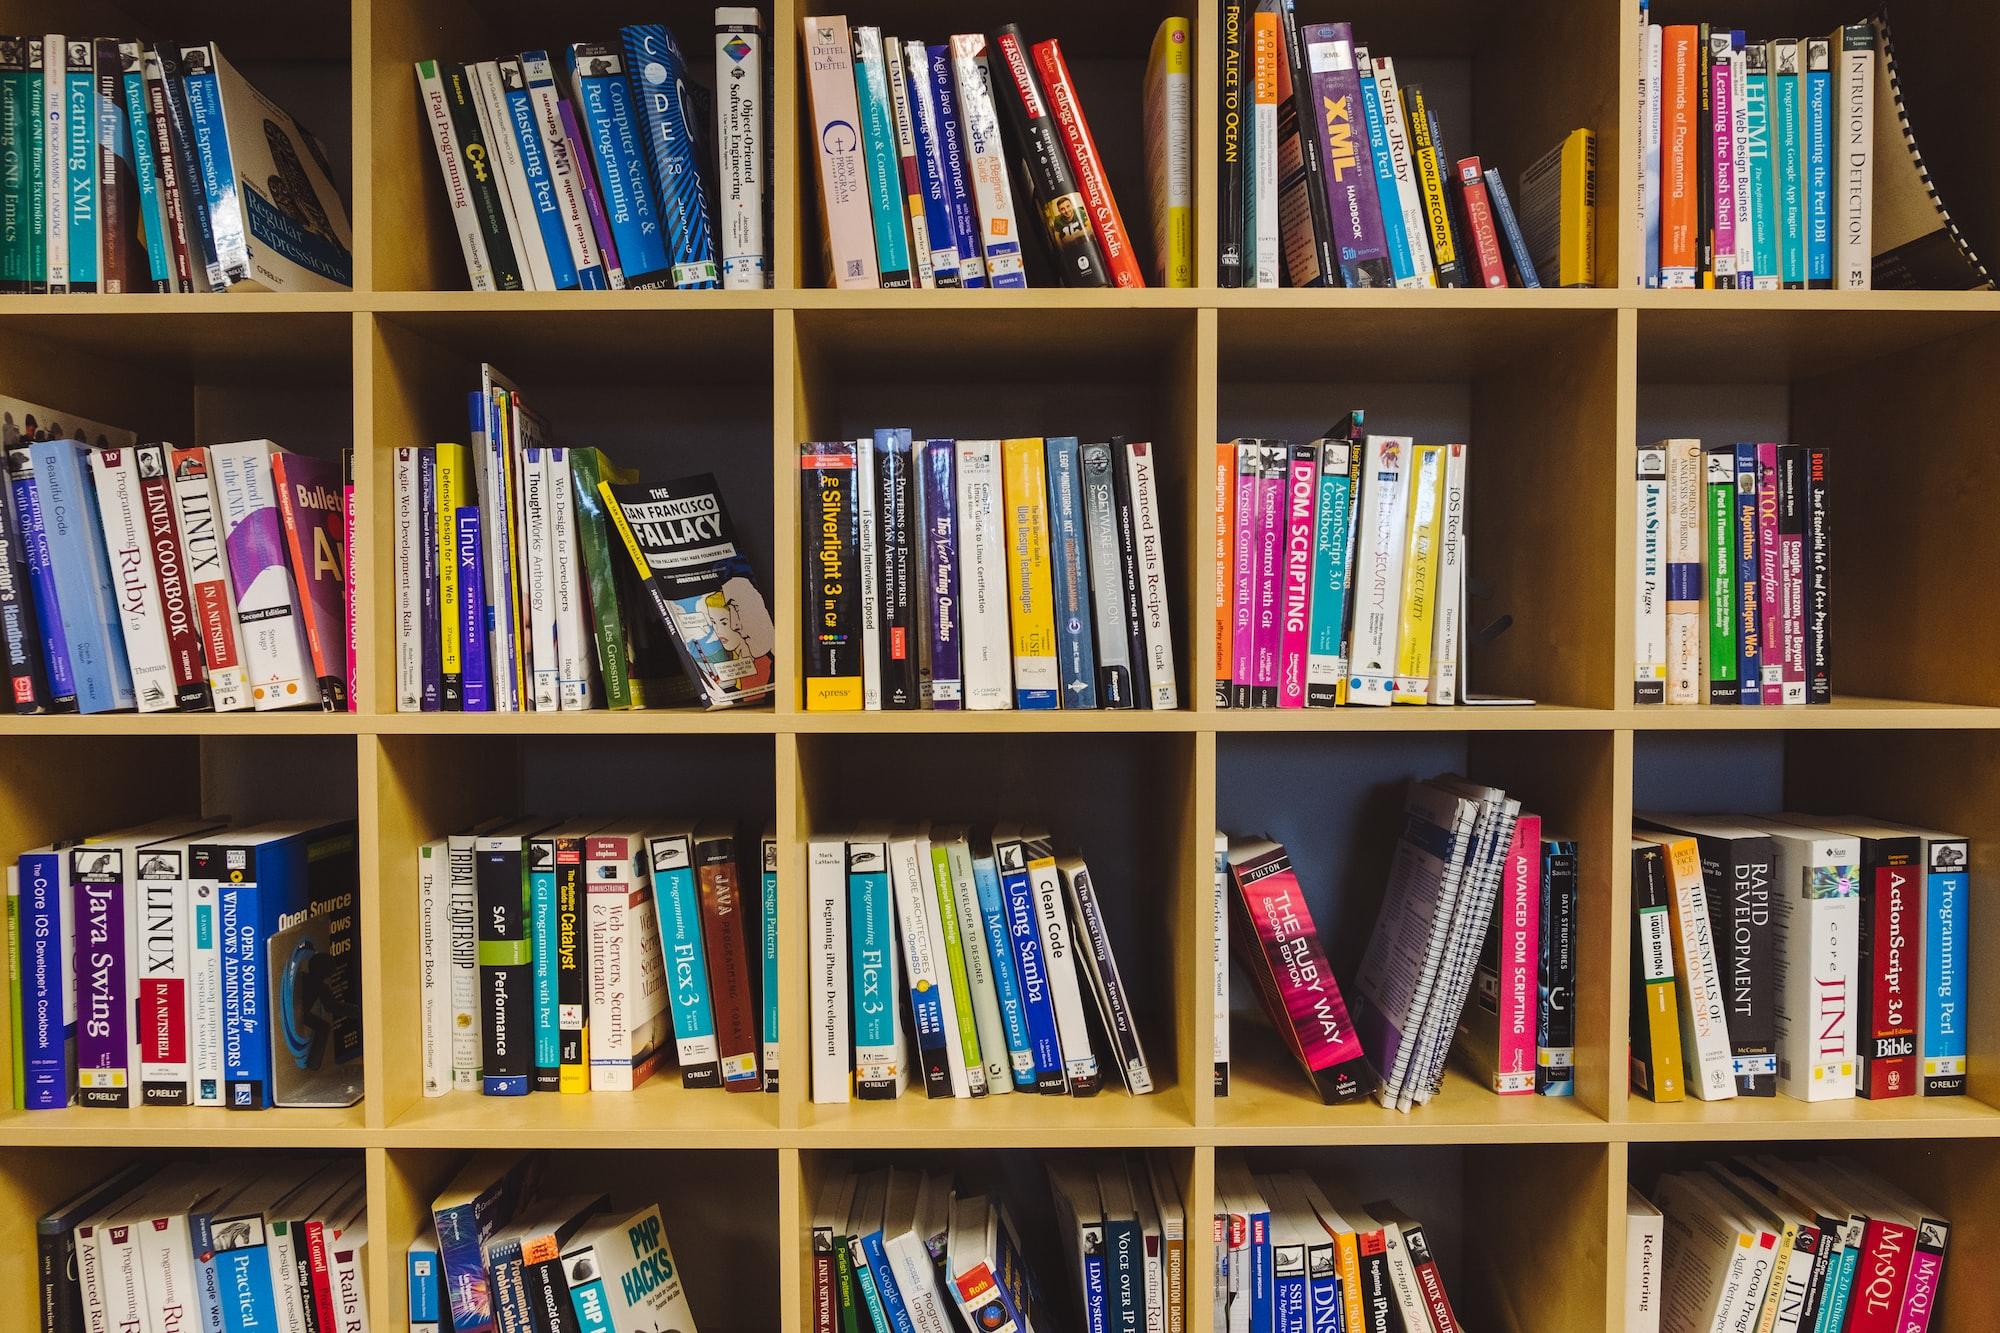 Data Literacy - New Age Literacy